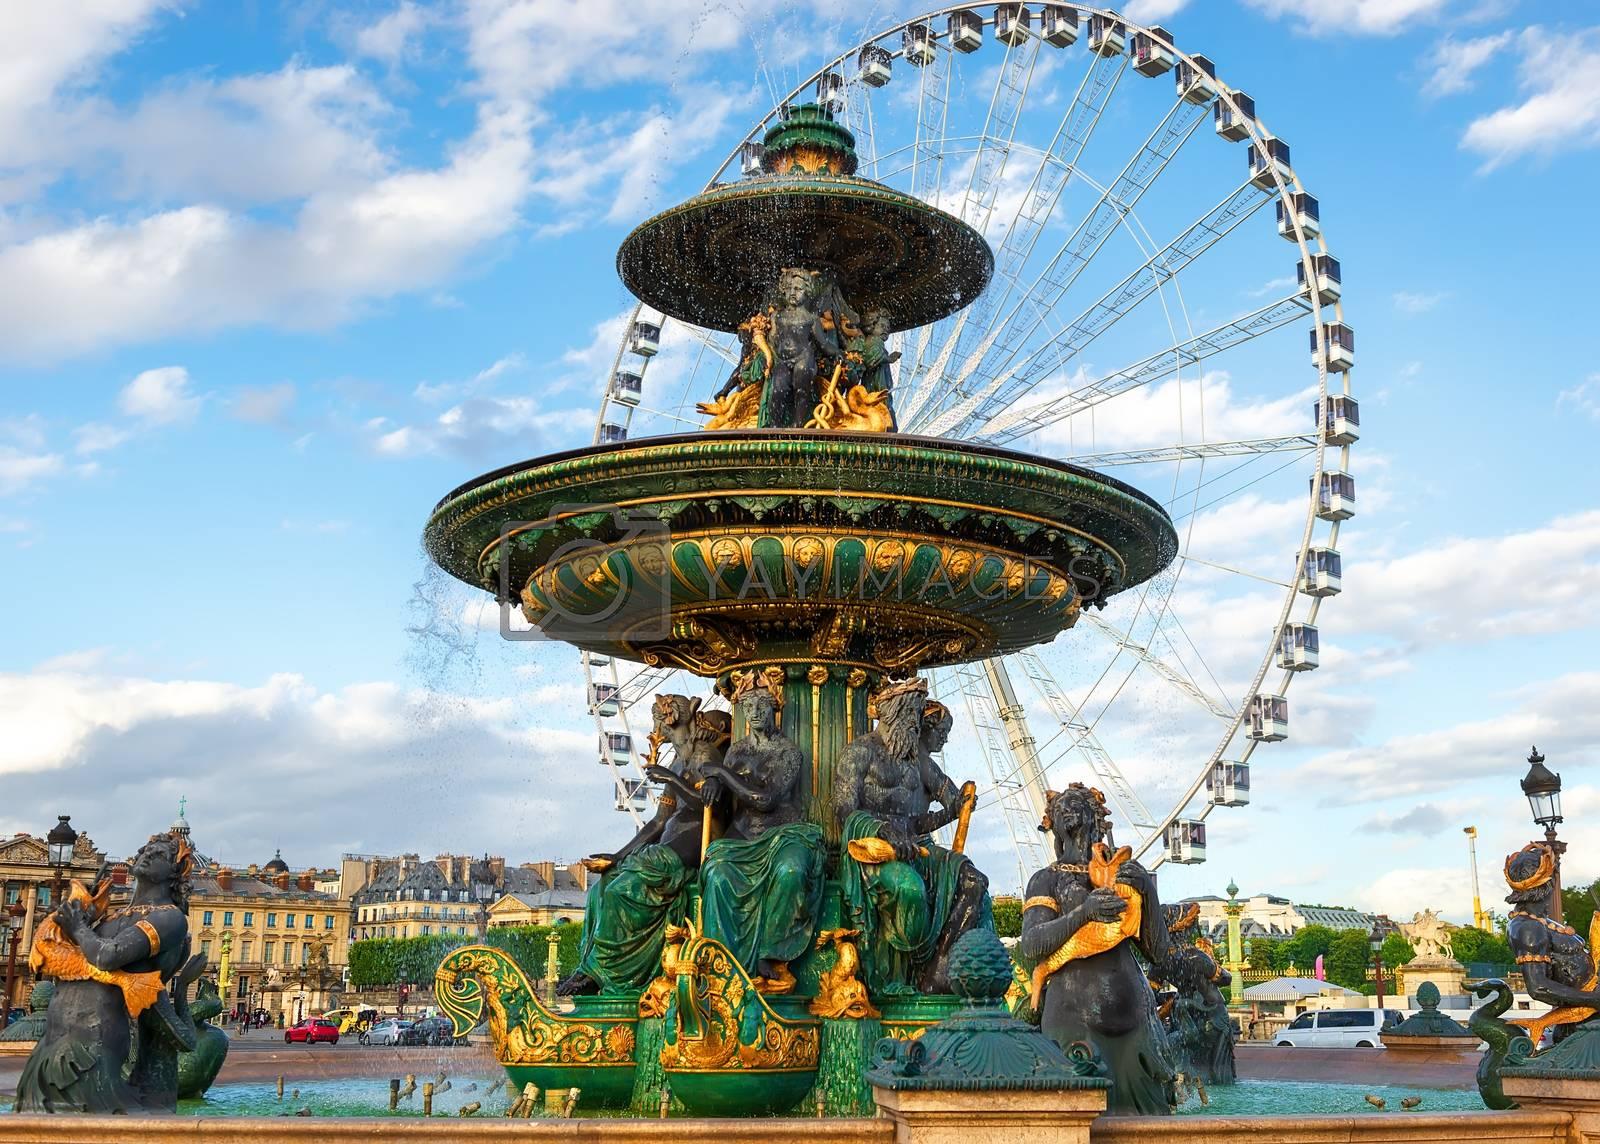 Fountain and ferris wheel in Paris at Place de la Concorde